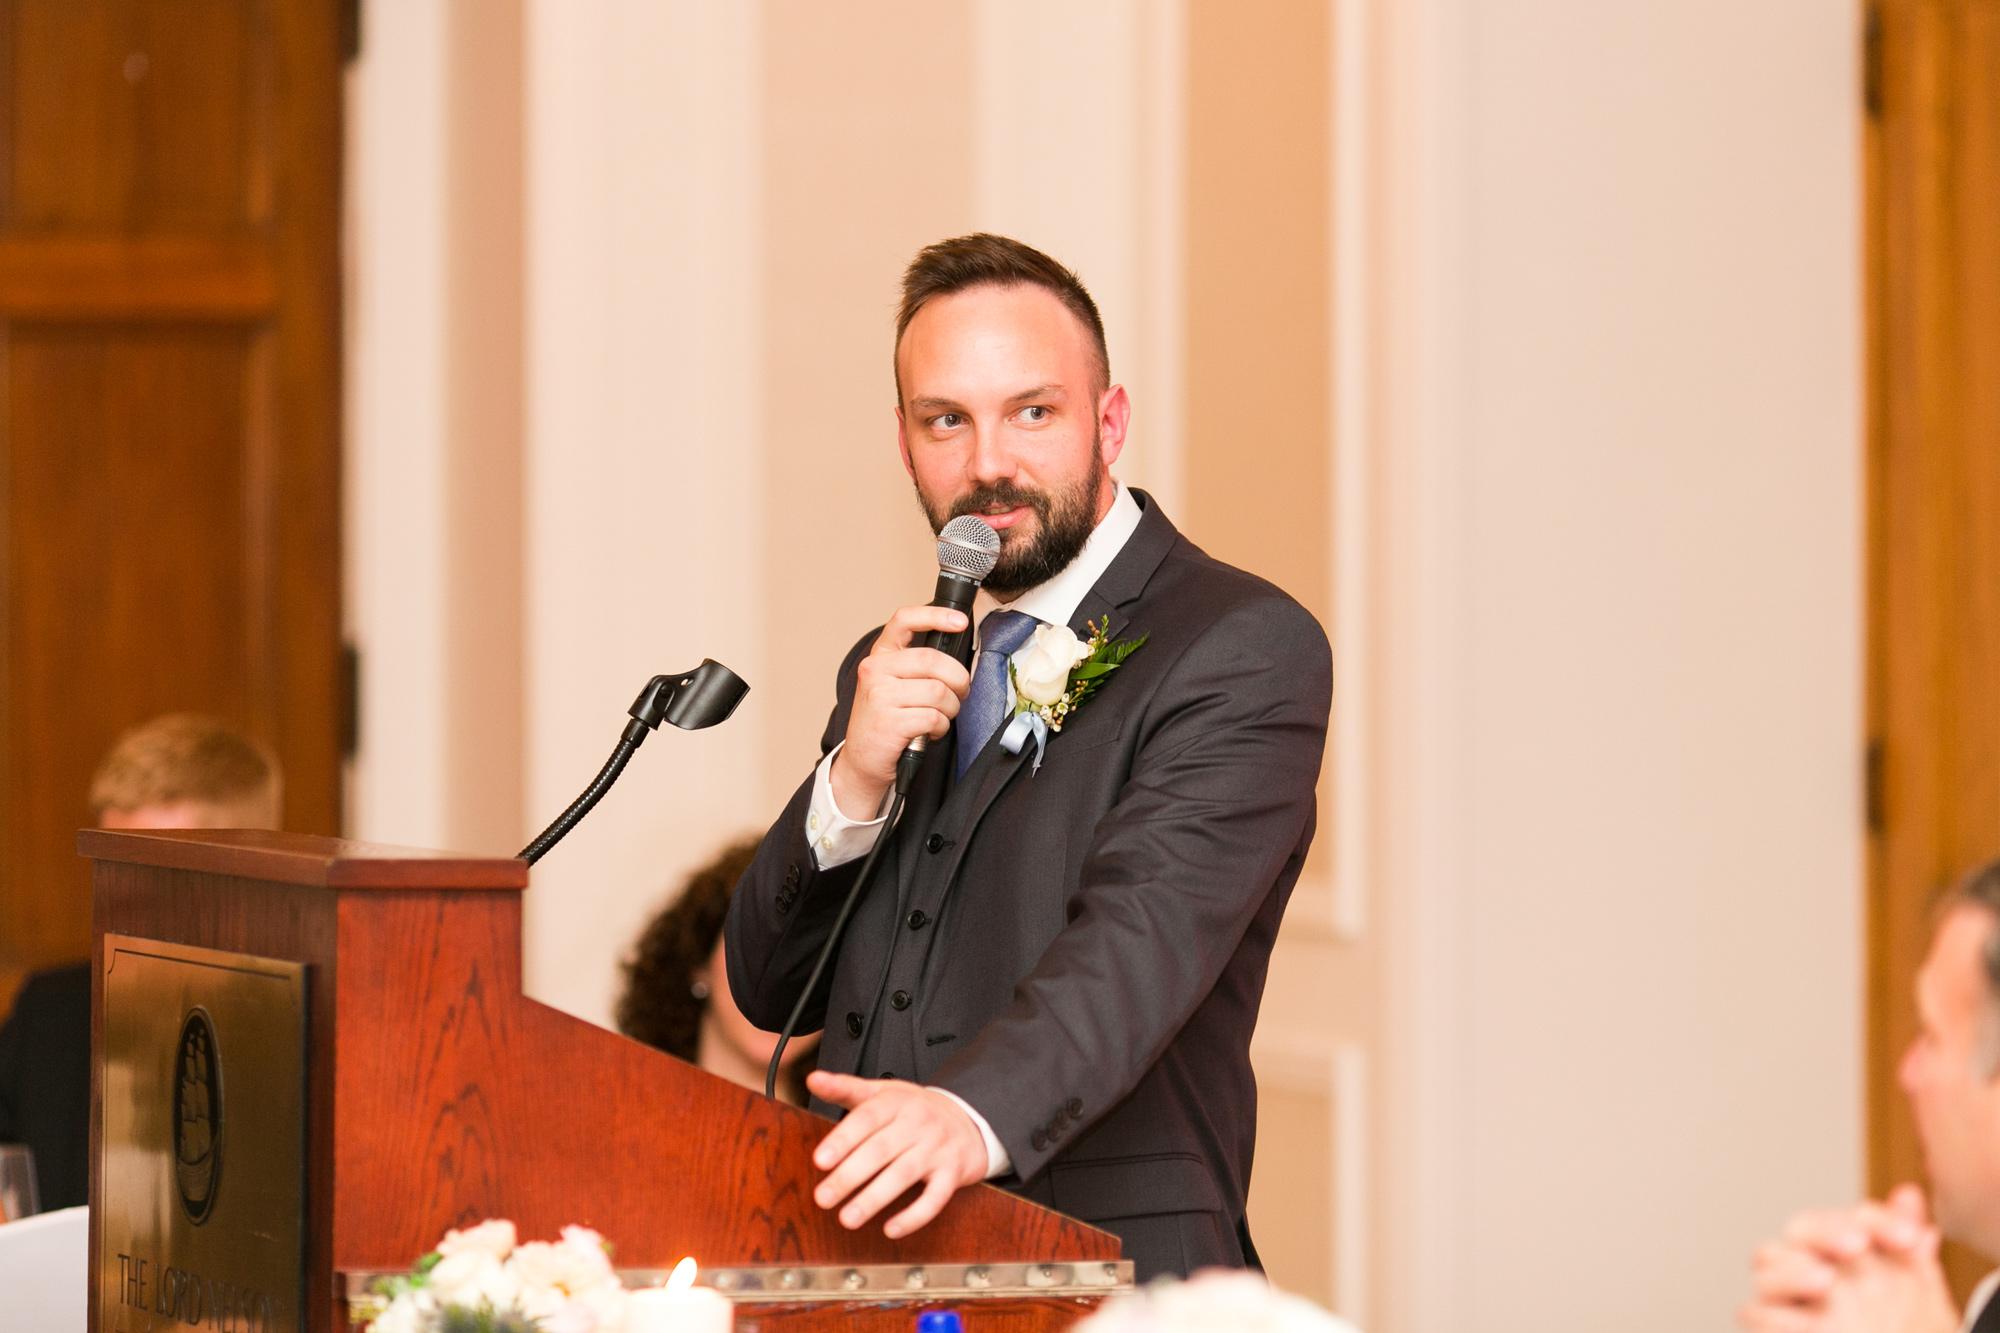 128-lord-nelson-wedding------.jpg